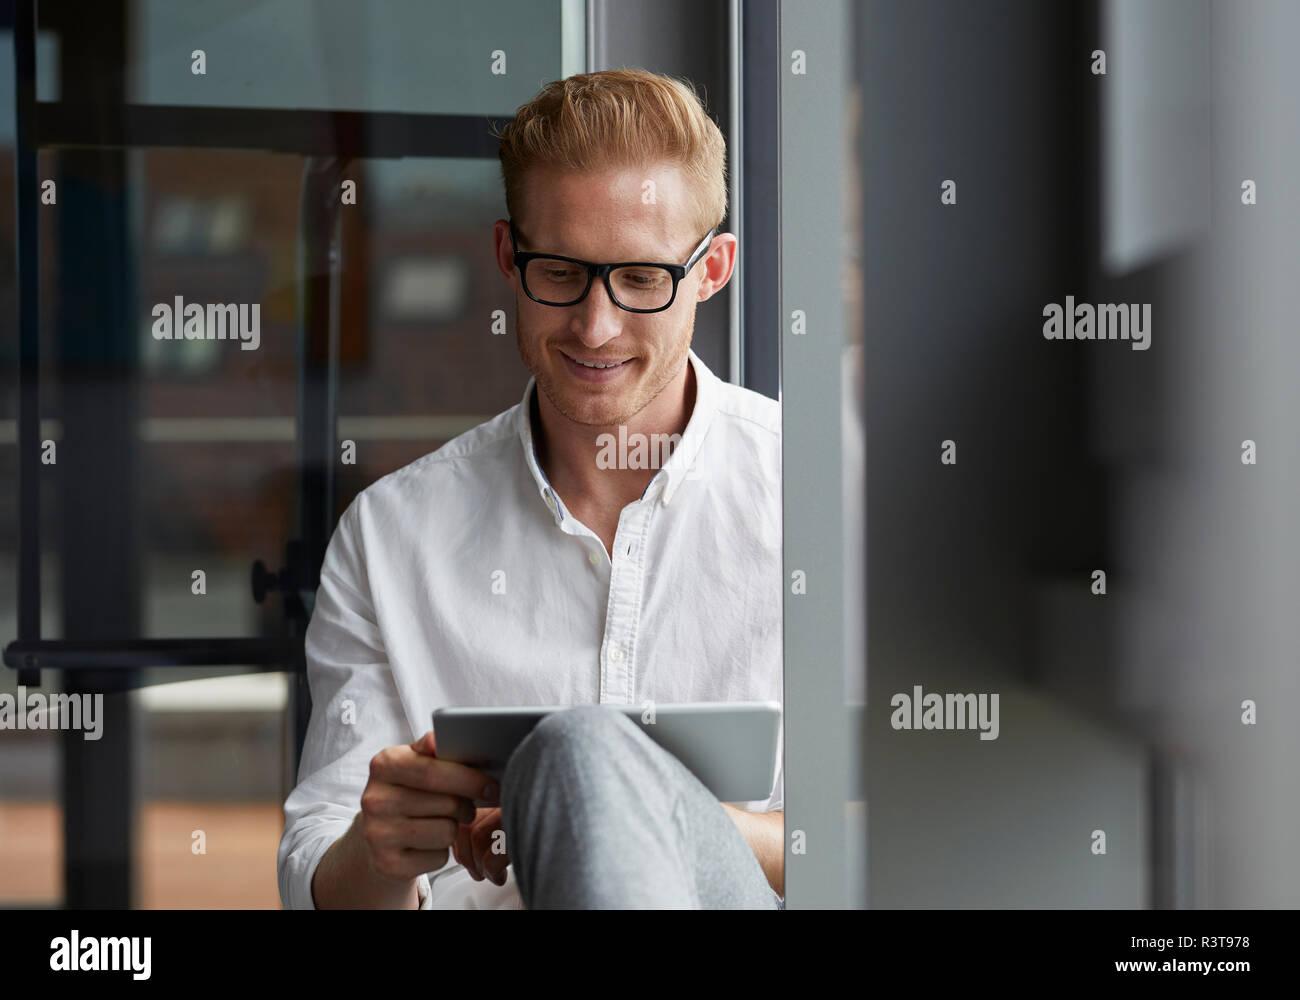 Smiling businessman sitting on windowsill using tablet - Stock Image